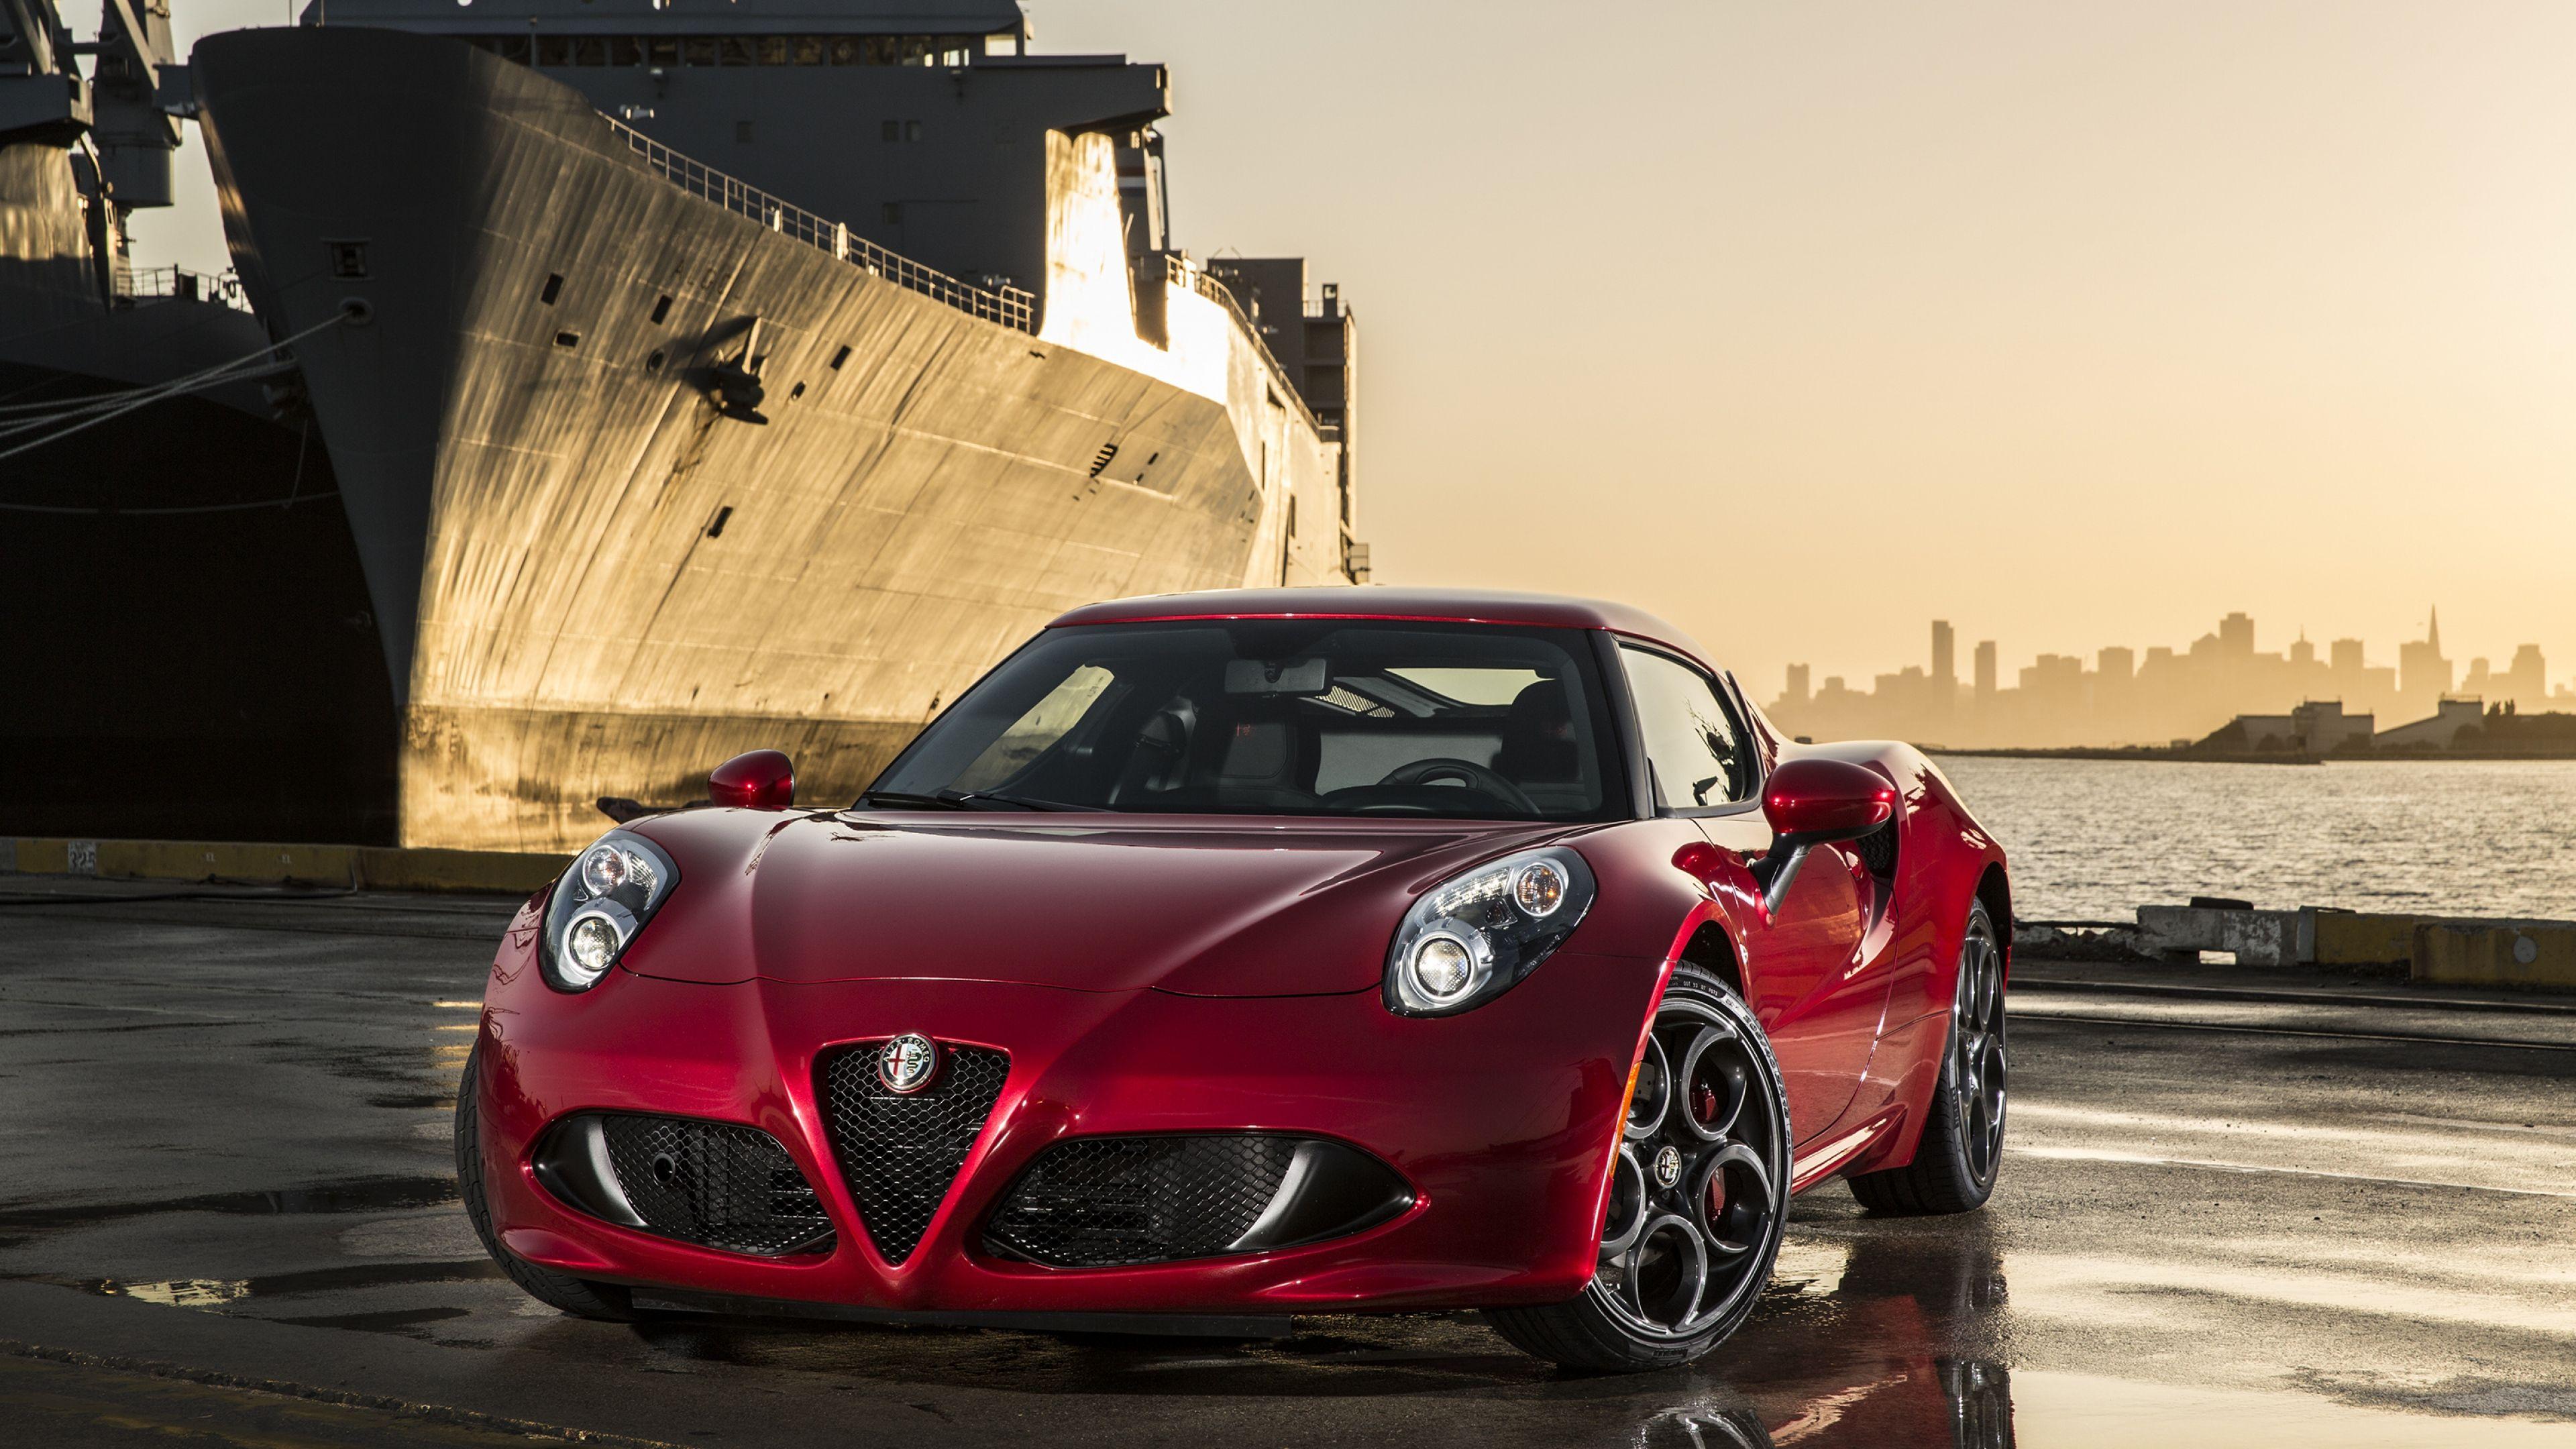 Download Wallpaper 3840x2160 Alfa Romeo 4c 2015 Red Sports Car